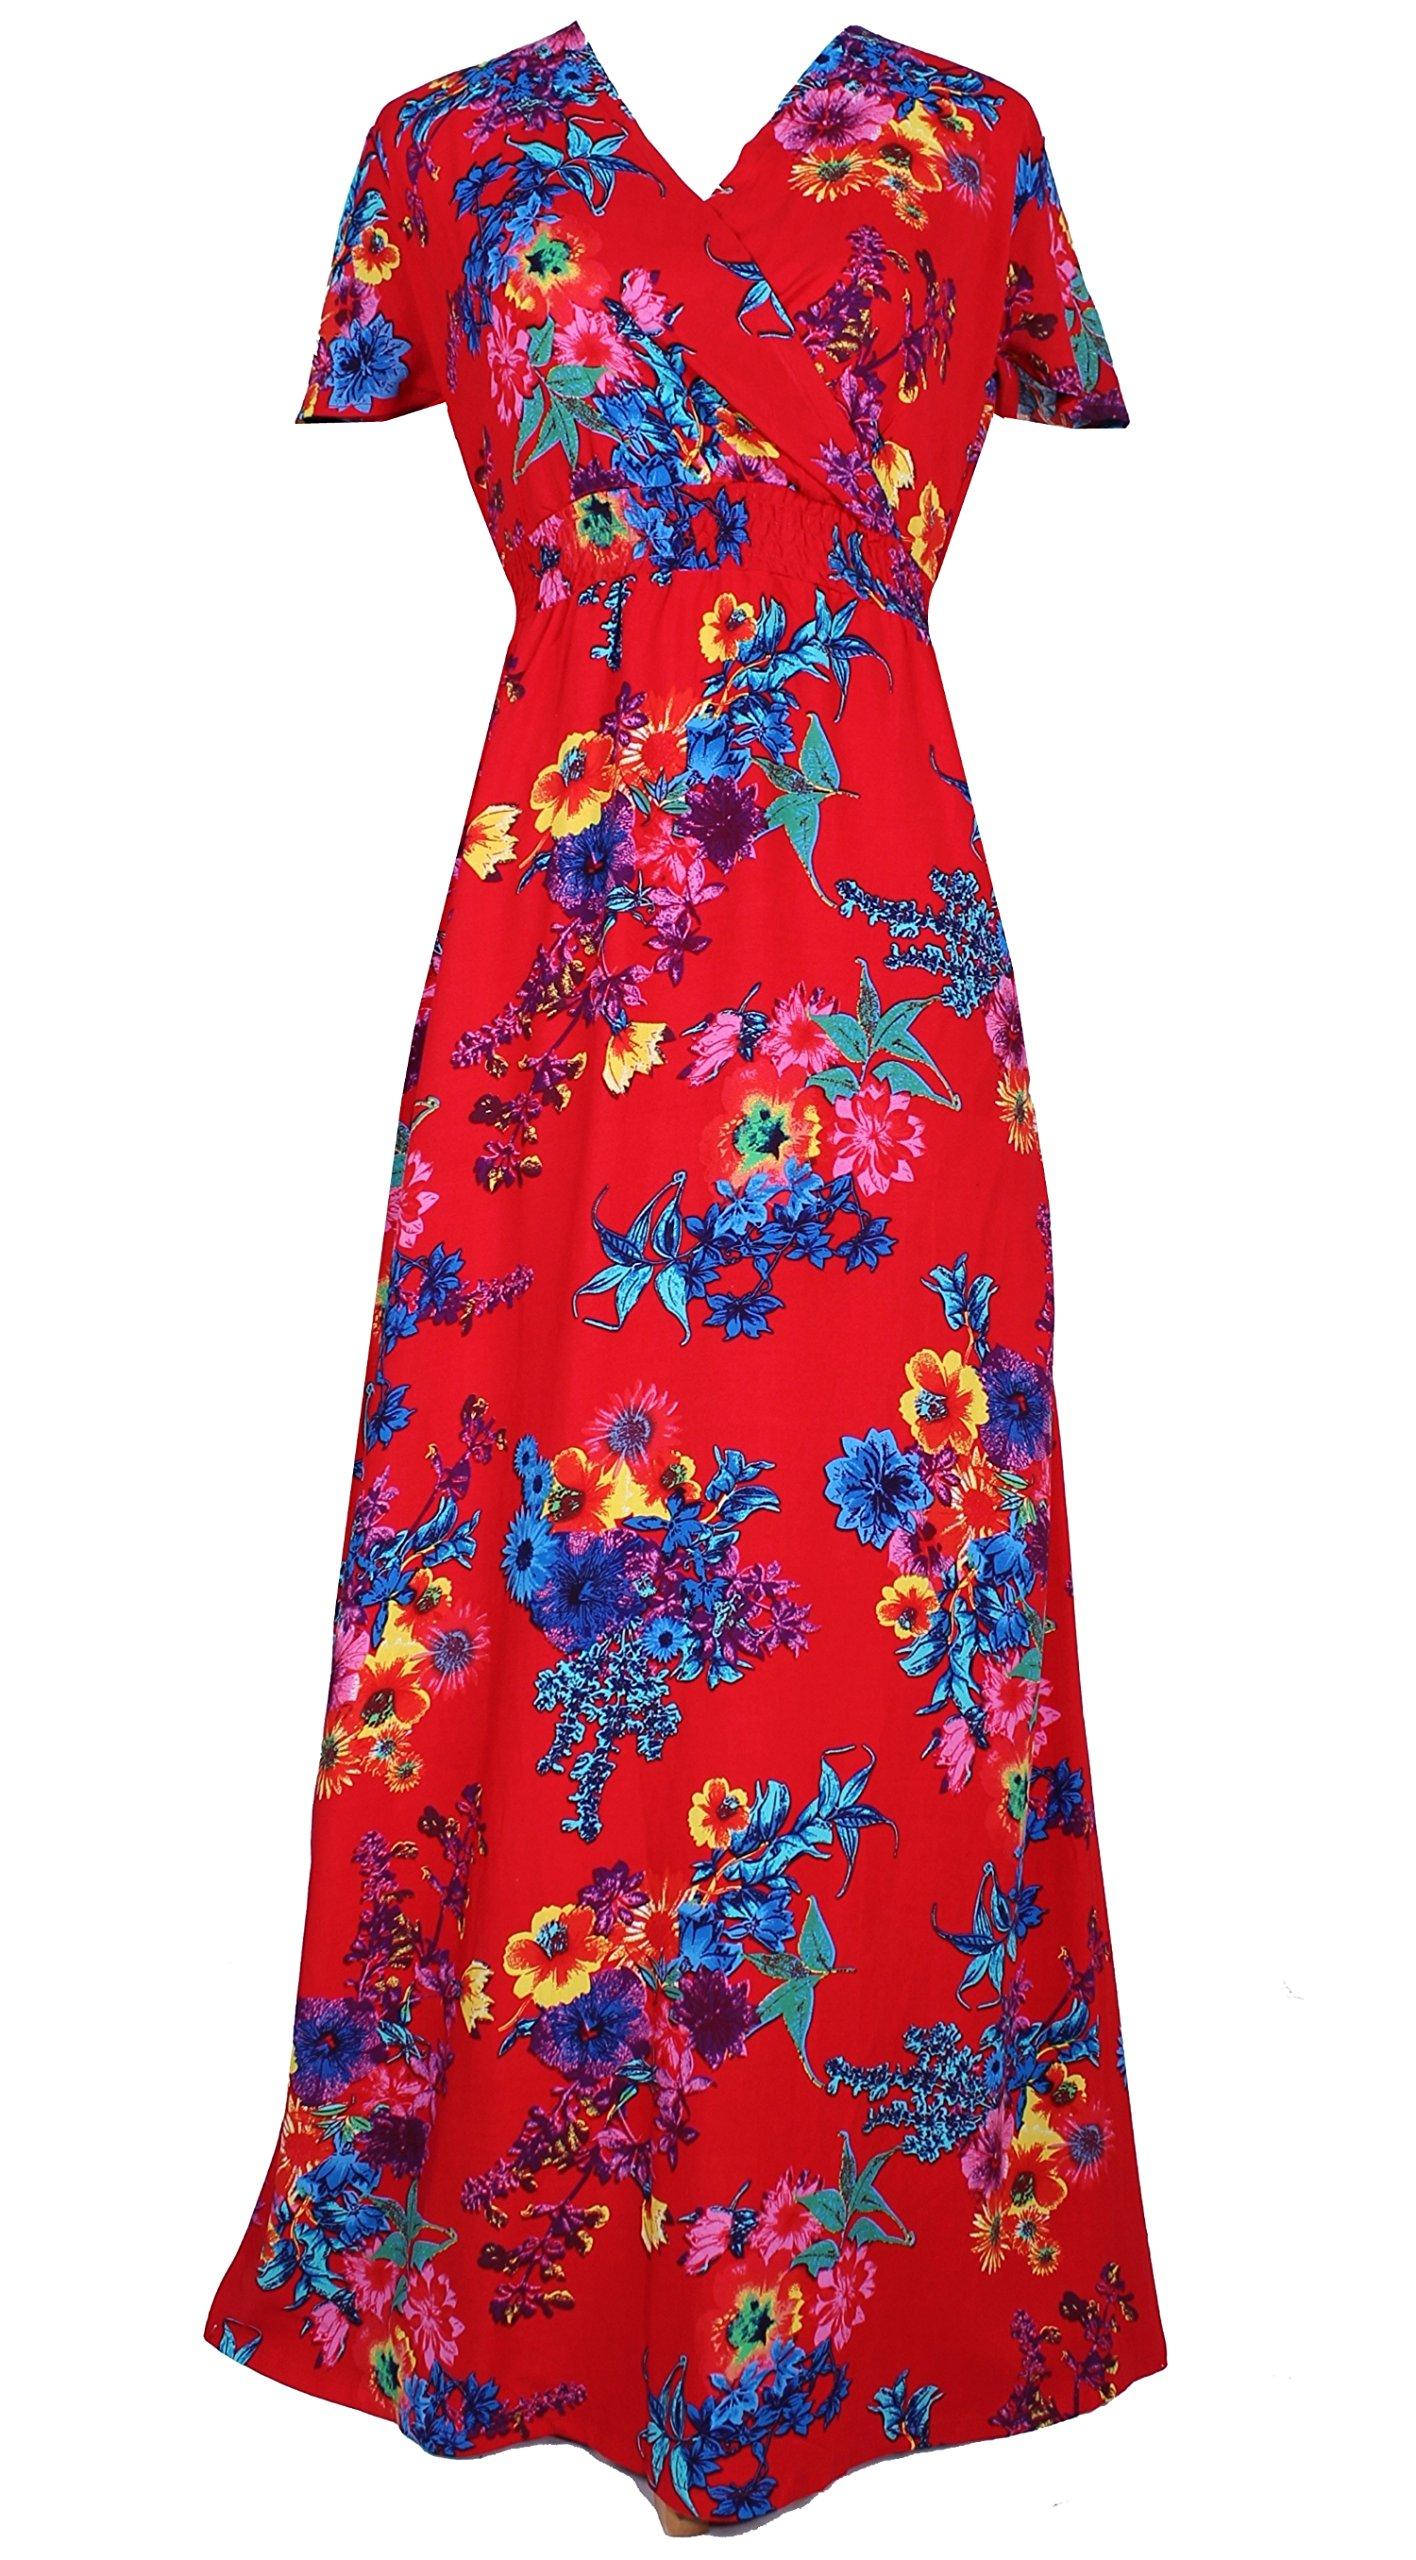 Women Black Summer Dress Maxi Plus Size Graduation Chiffon Gift Long Sleeveless Sexy Floral Sundress (3X, Red/Blue Floral)